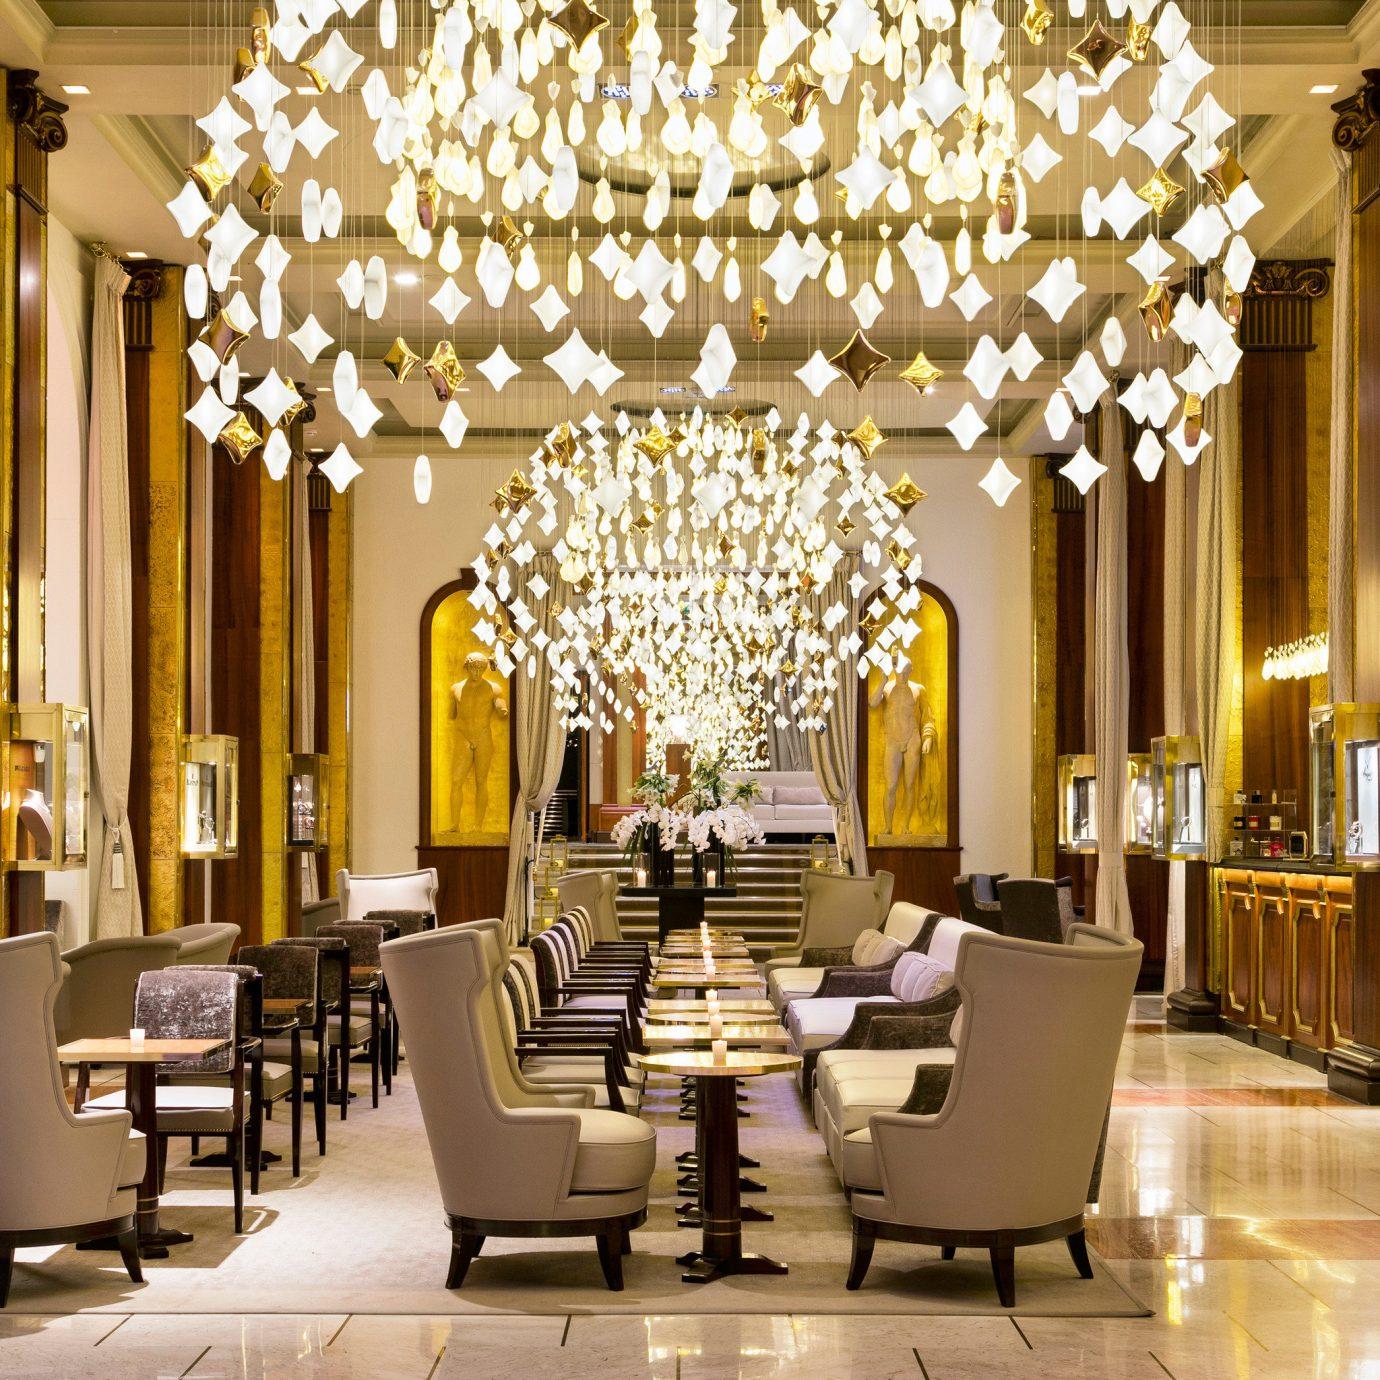 Lobby function hall restaurant lighting palace ballroom